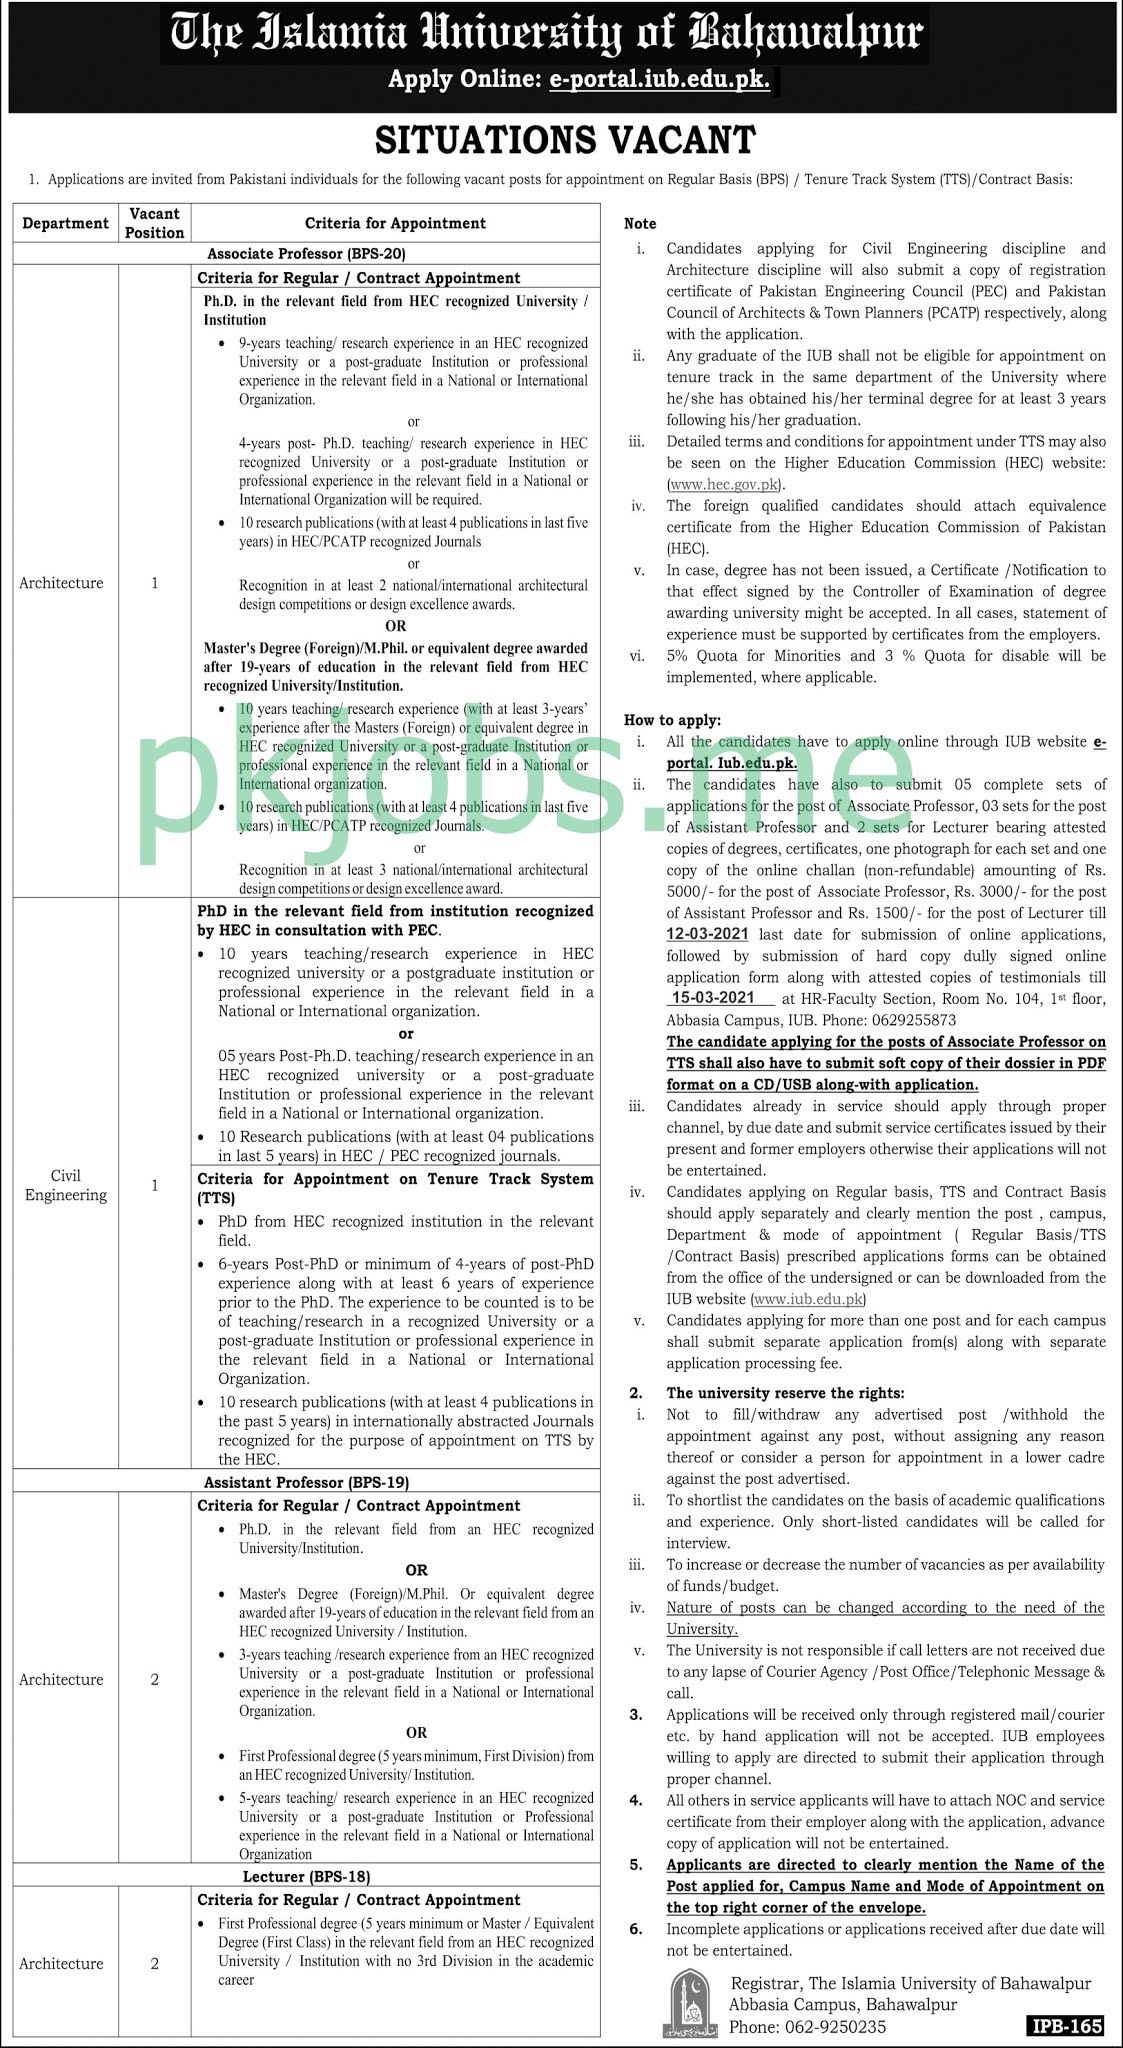 Latest The Islamia University of Bahawalpur Posts 2021